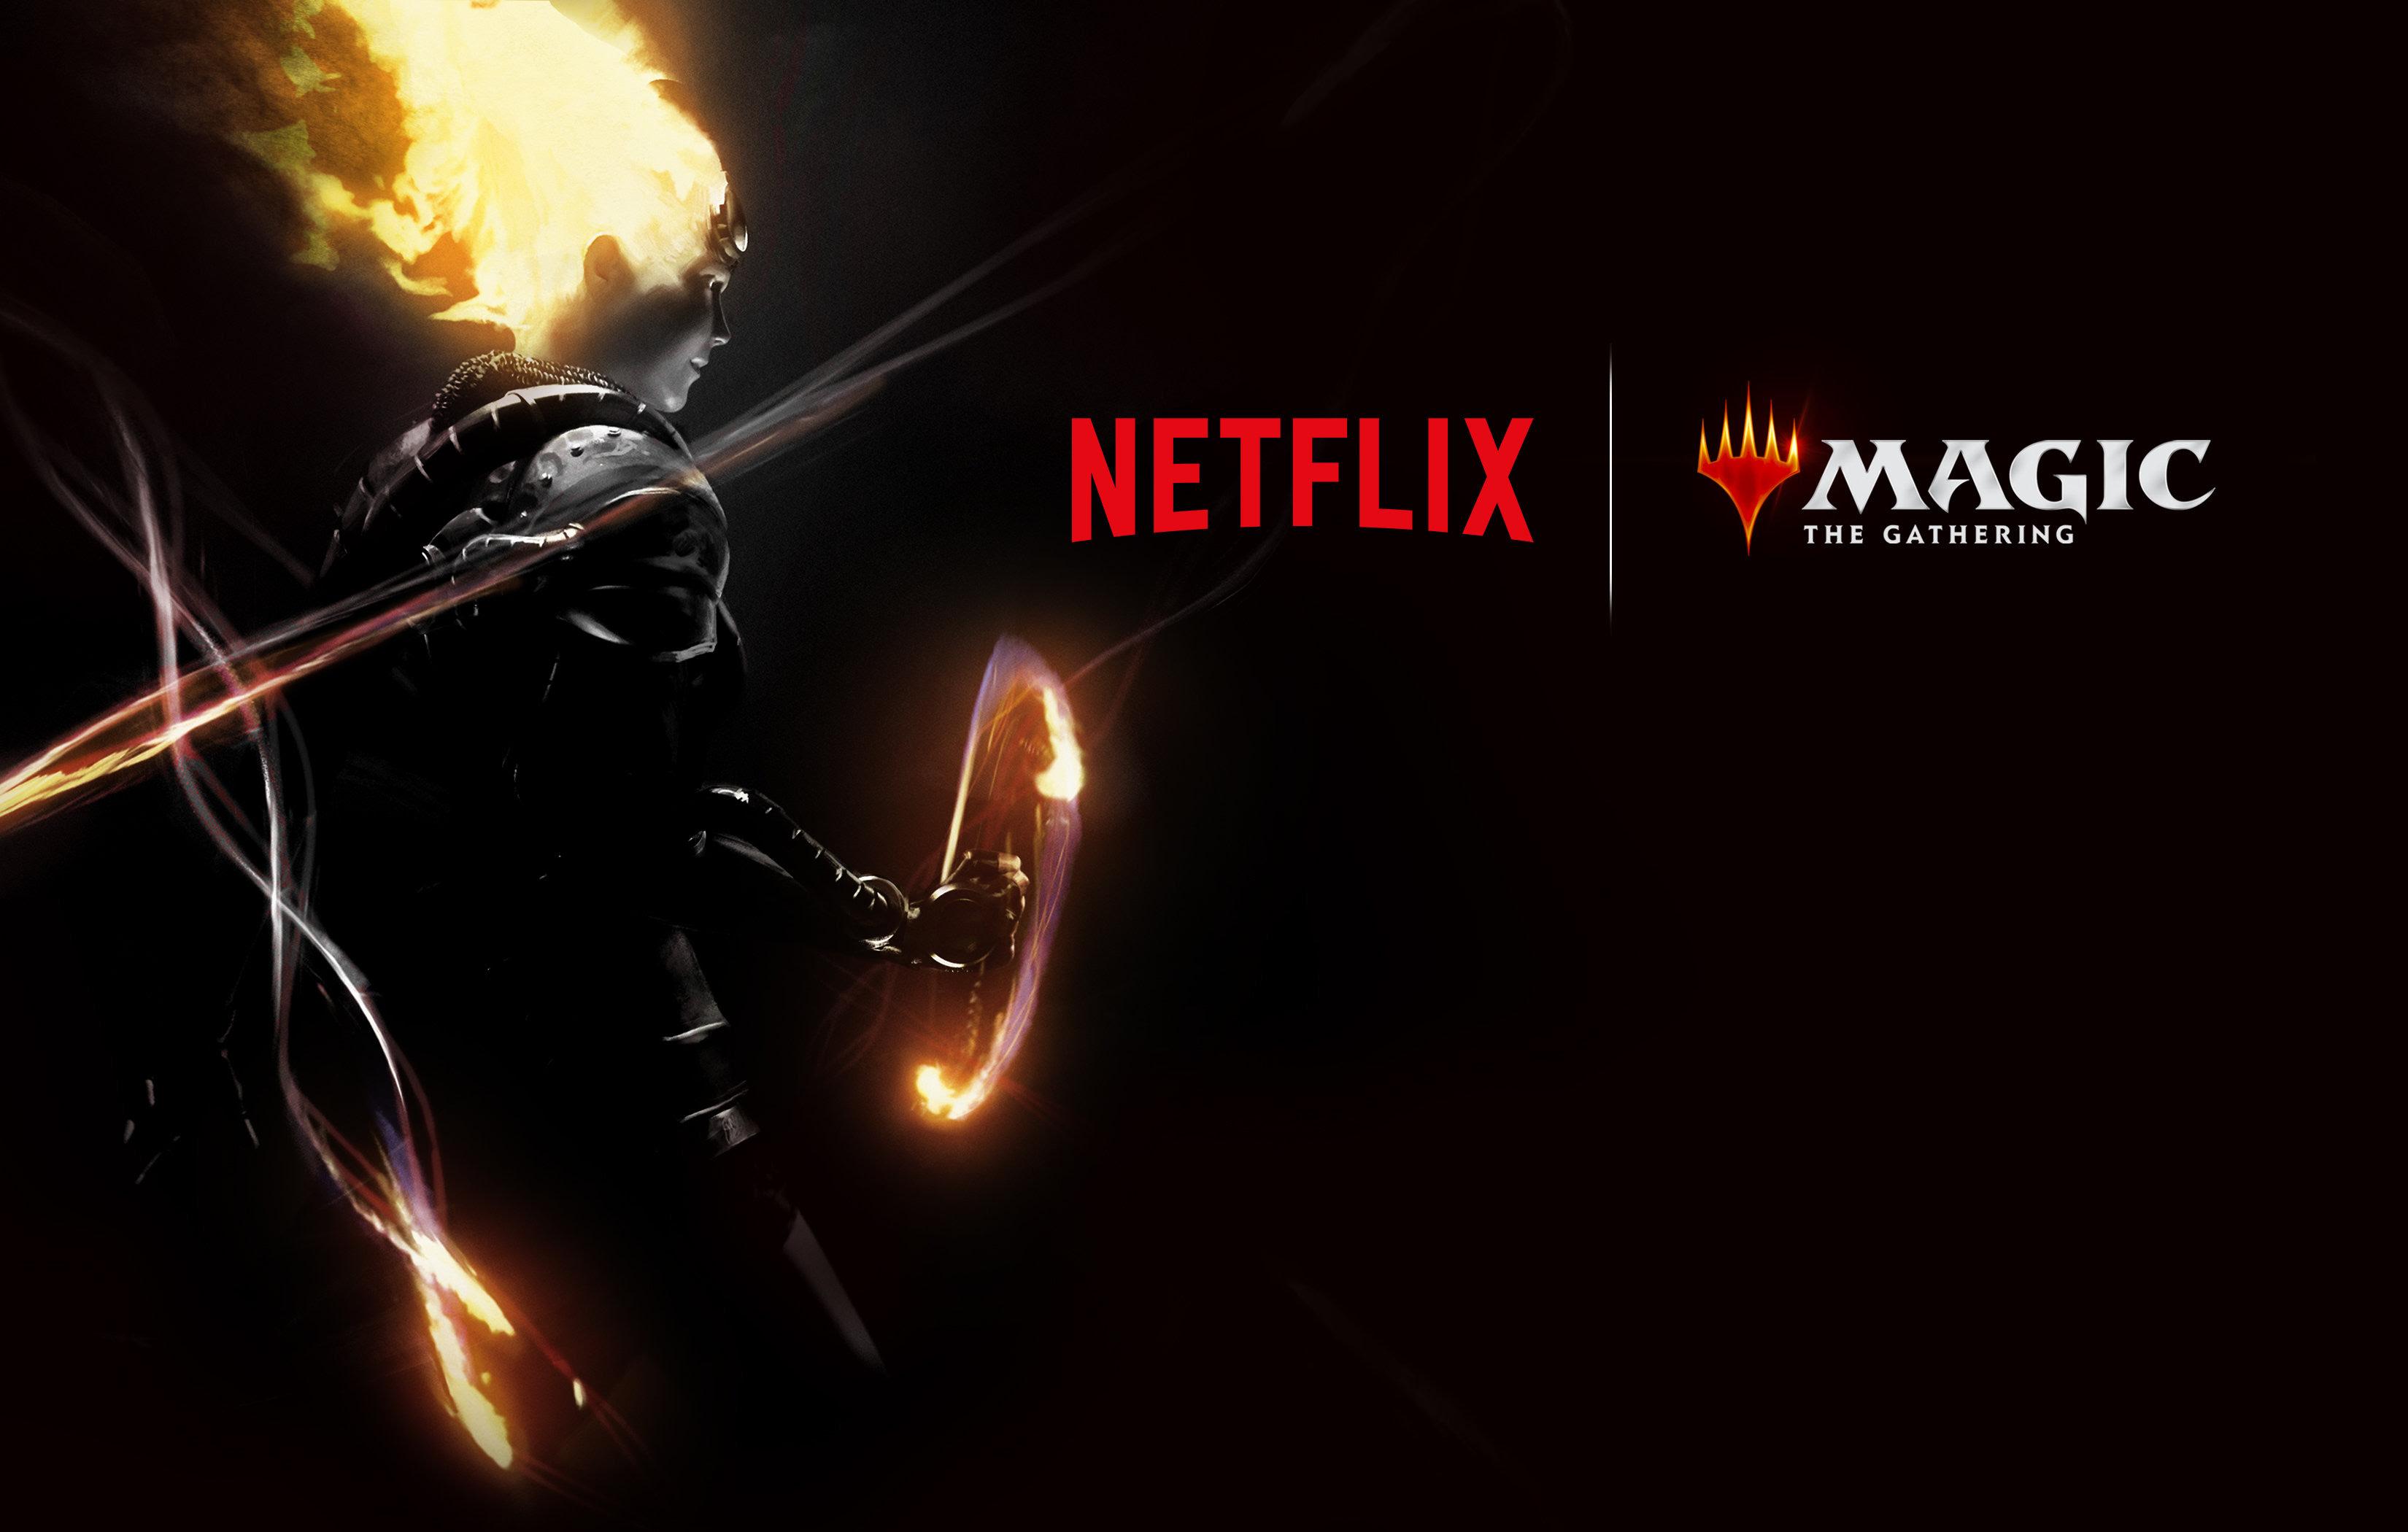 Netflix tendrá serie de 'Magic: The Gathering'